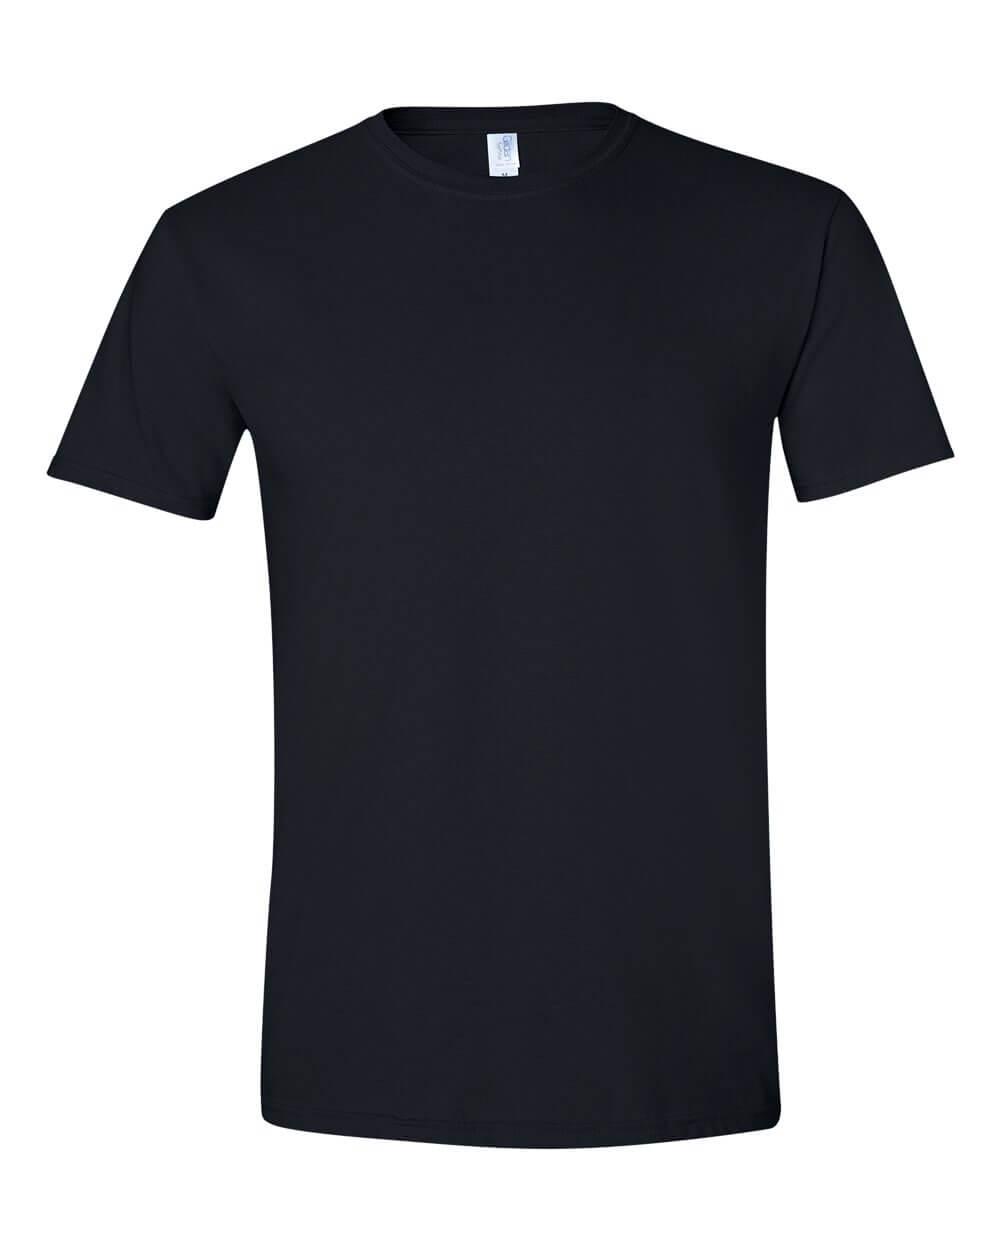 Gildan-Mens-Softstyle-Black-Custom-T-Shirts